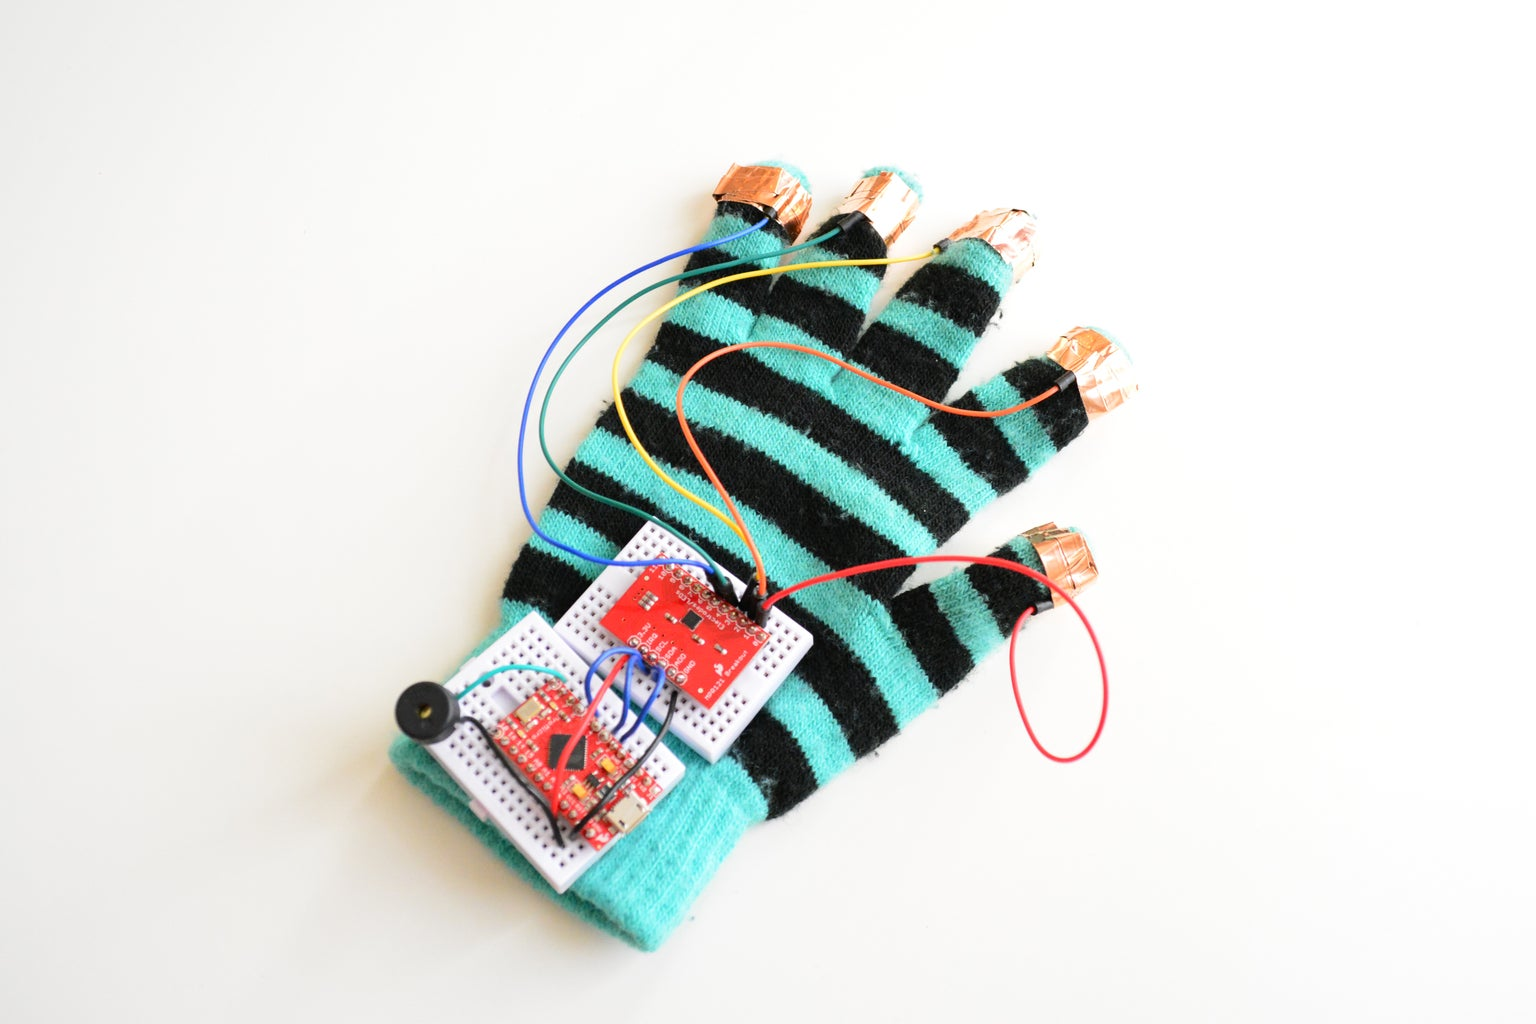 The SomaPhonic Glove